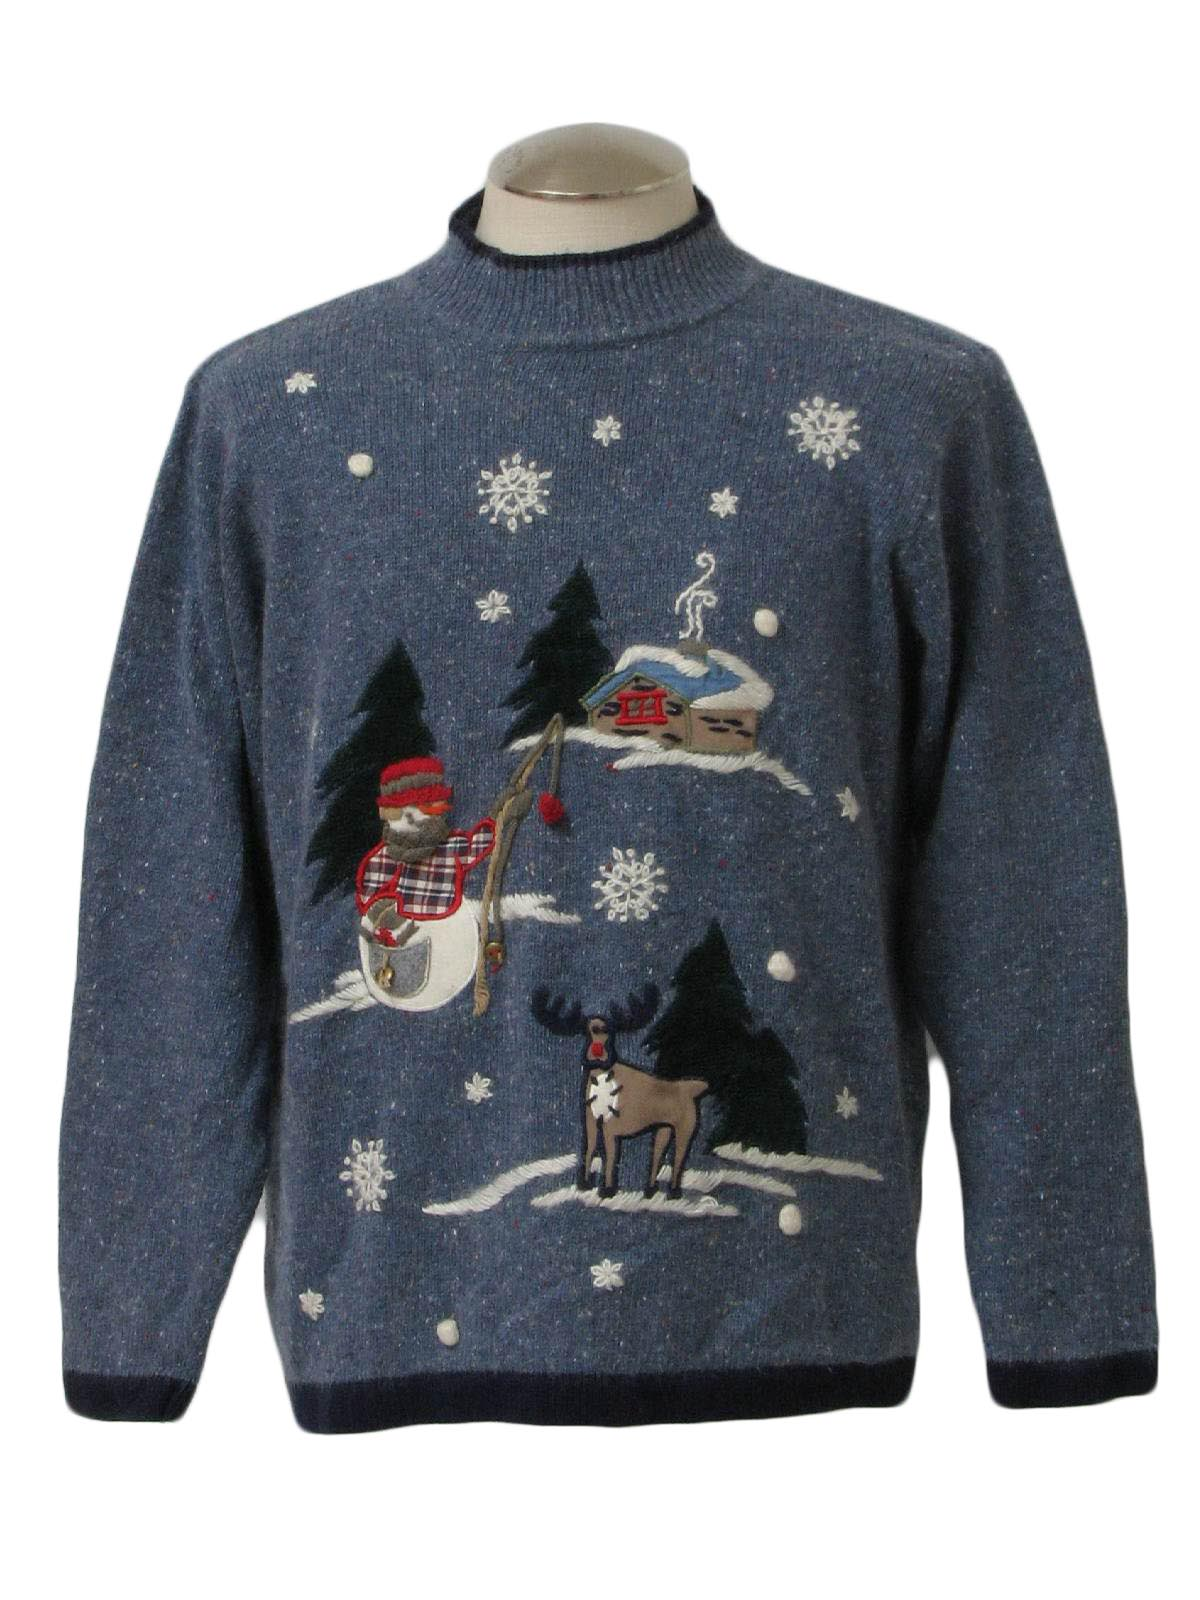 Fishing snowman ugly christmas sweater victoria jones for Fishing ugly christmas sweater